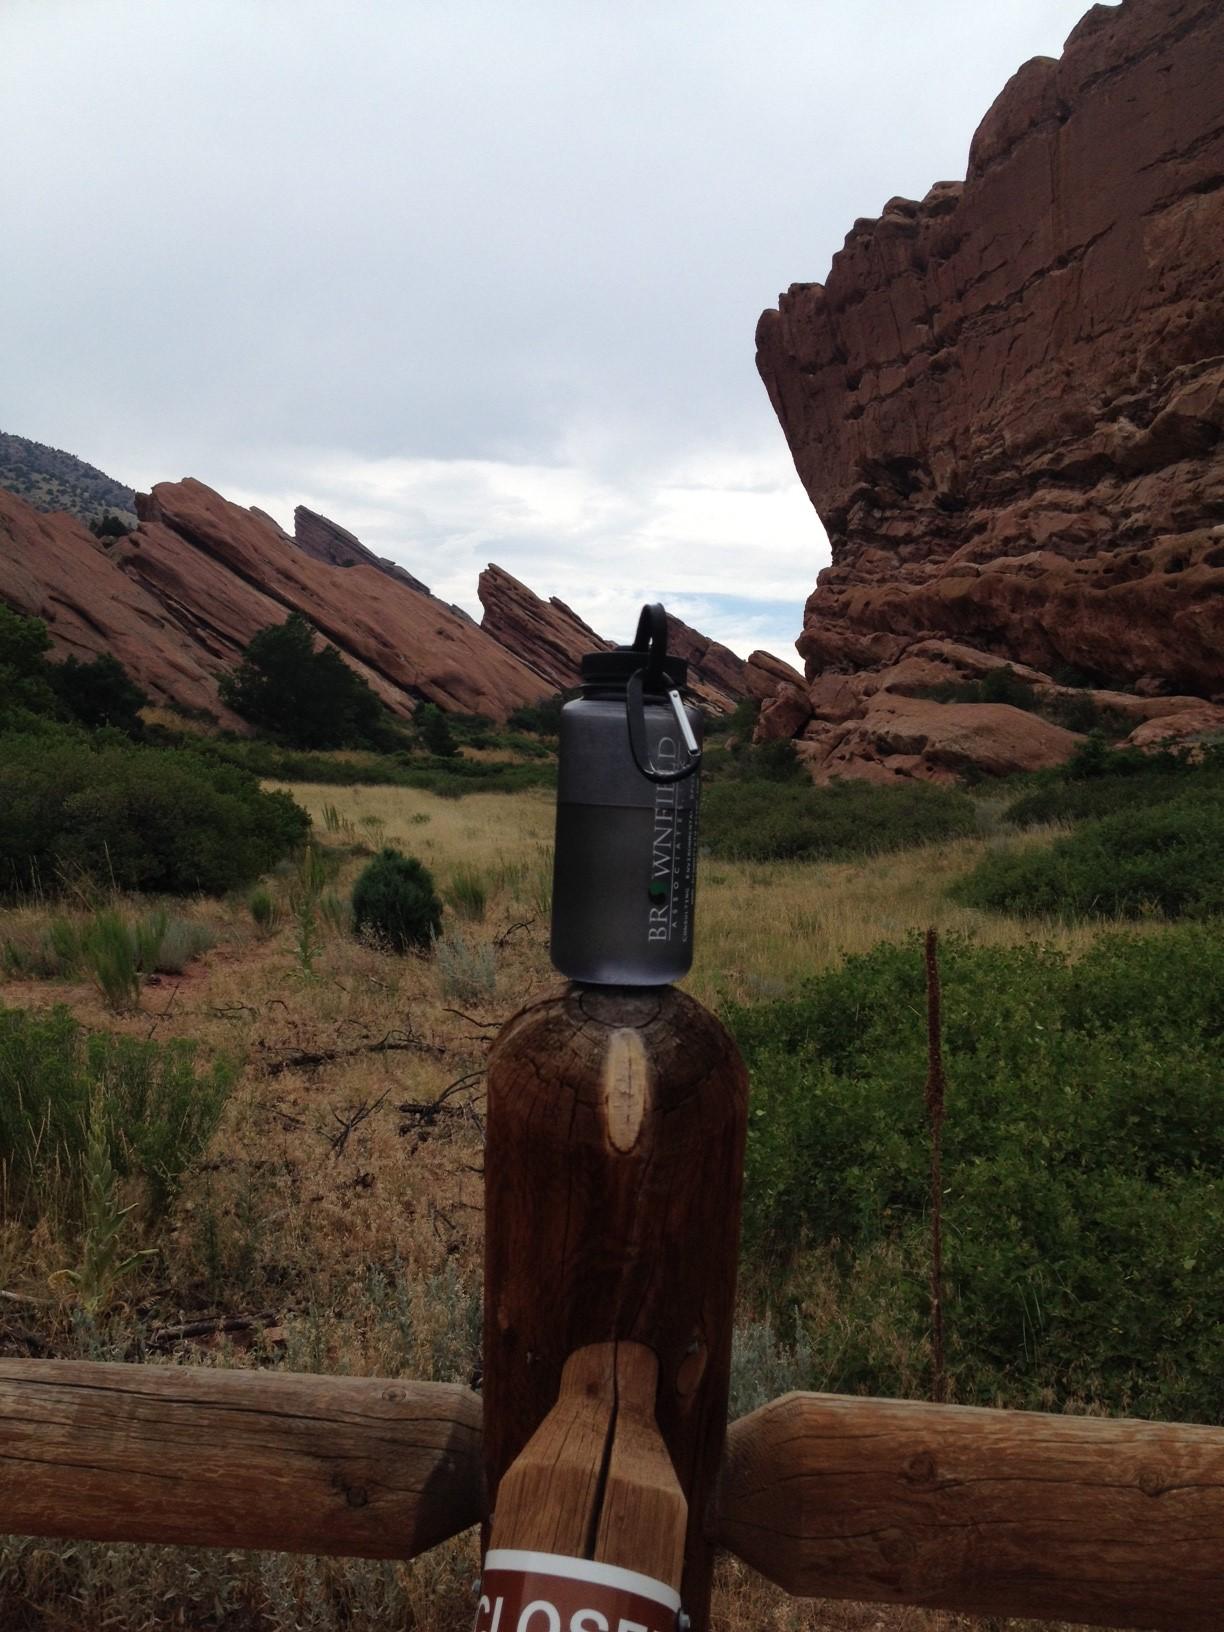 Adventuring around Red Rocks, CO